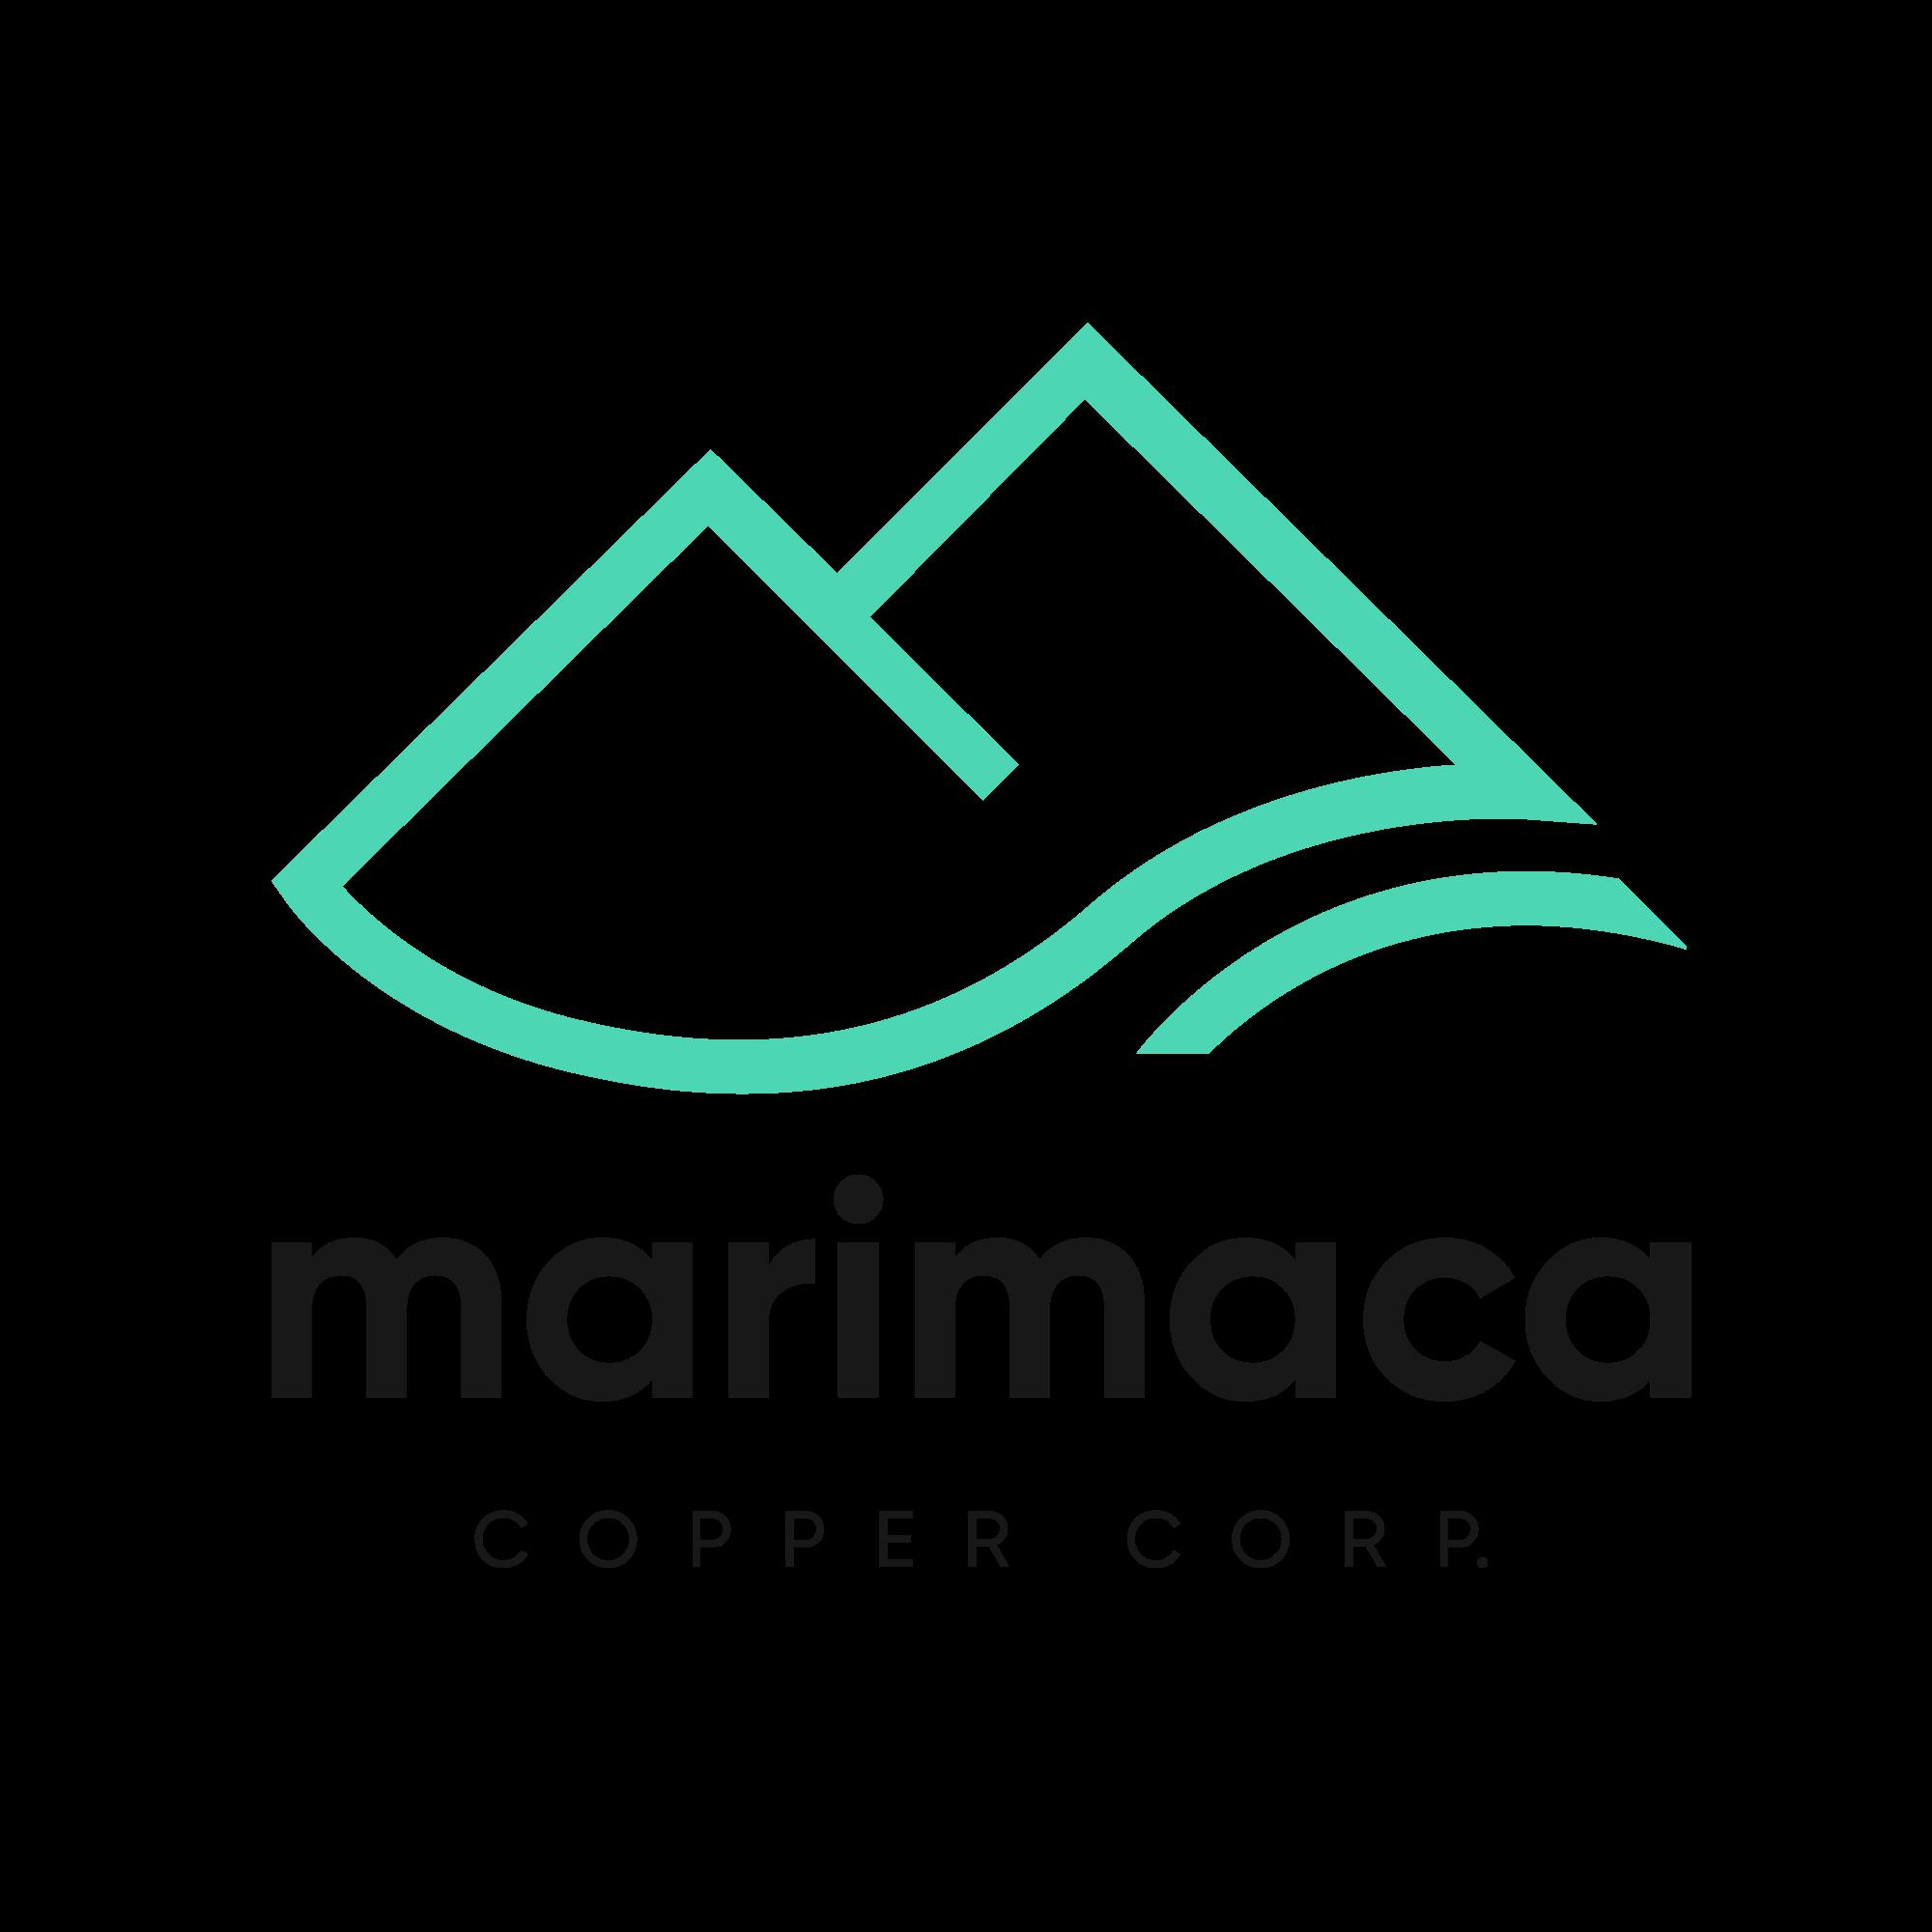 Coro Announces Change of Name to Marimaca Copper Corp